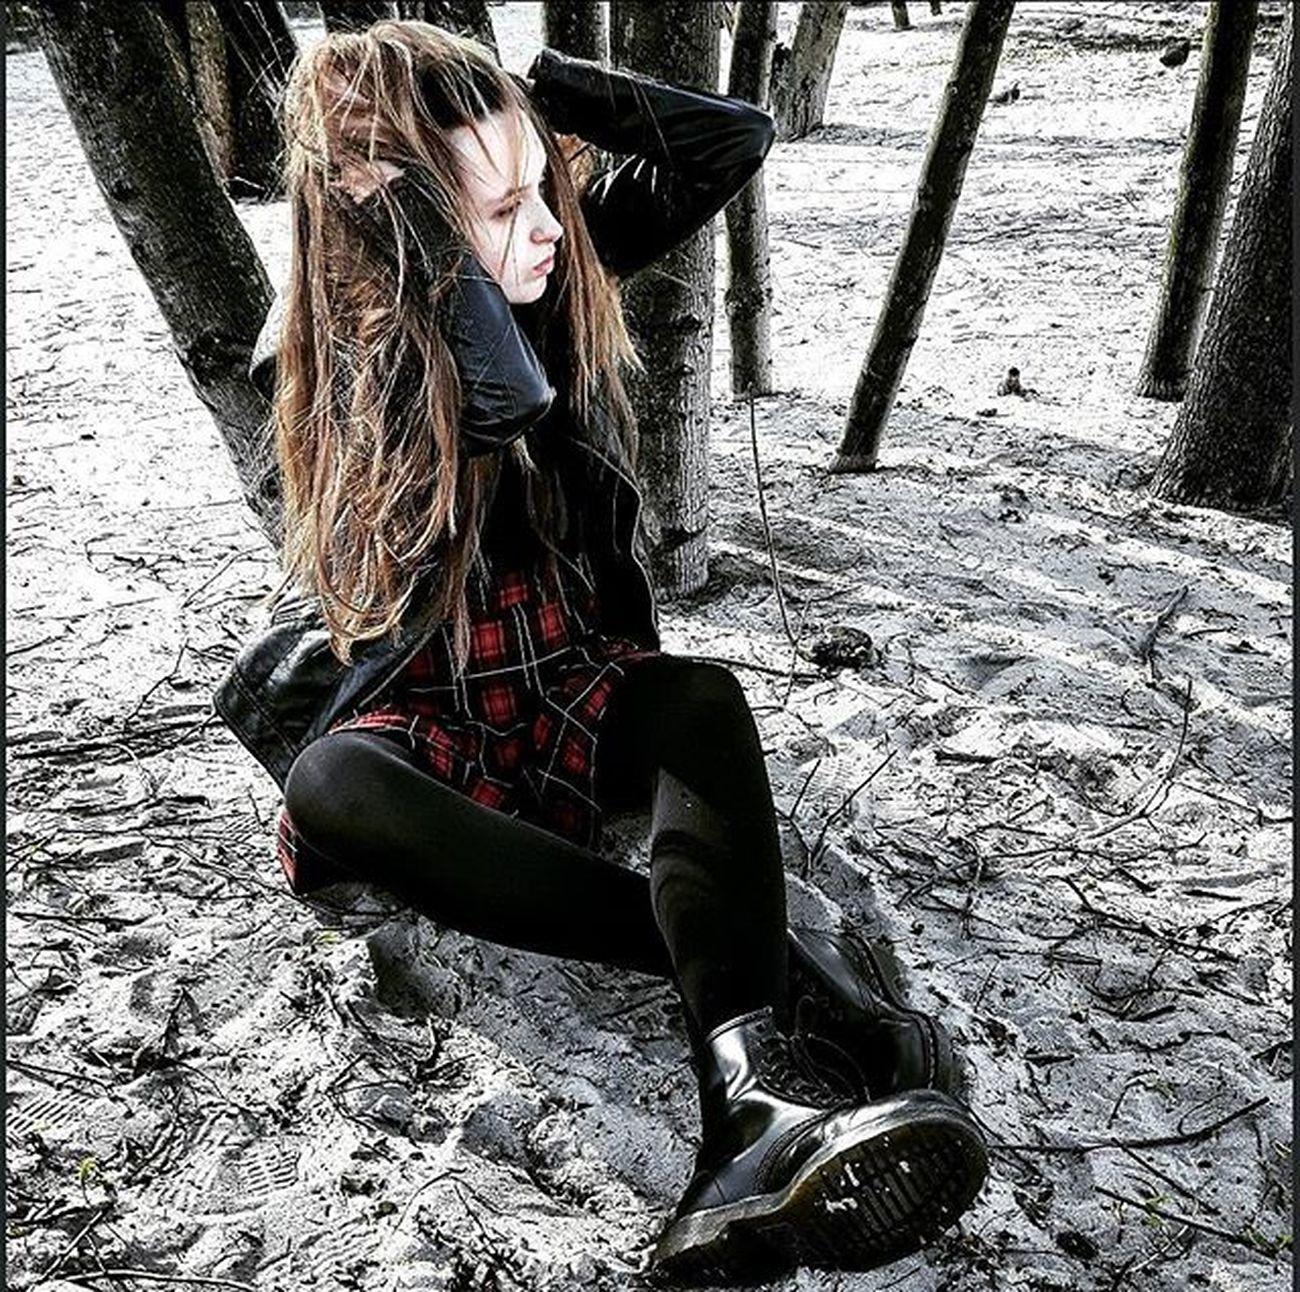 📷@alicja.dro Me Girl Polishgirl Instagirl Rockgirl Punkgirl Rockstyle Punkstyle Rock Punk Musicstyle Musiclife Poland Sopot Bitch Nearsea Trees Skirt Brown Hair Longhair Black Niecephoto Beutyday Ja muzykadrzewawłosydługiewłosy